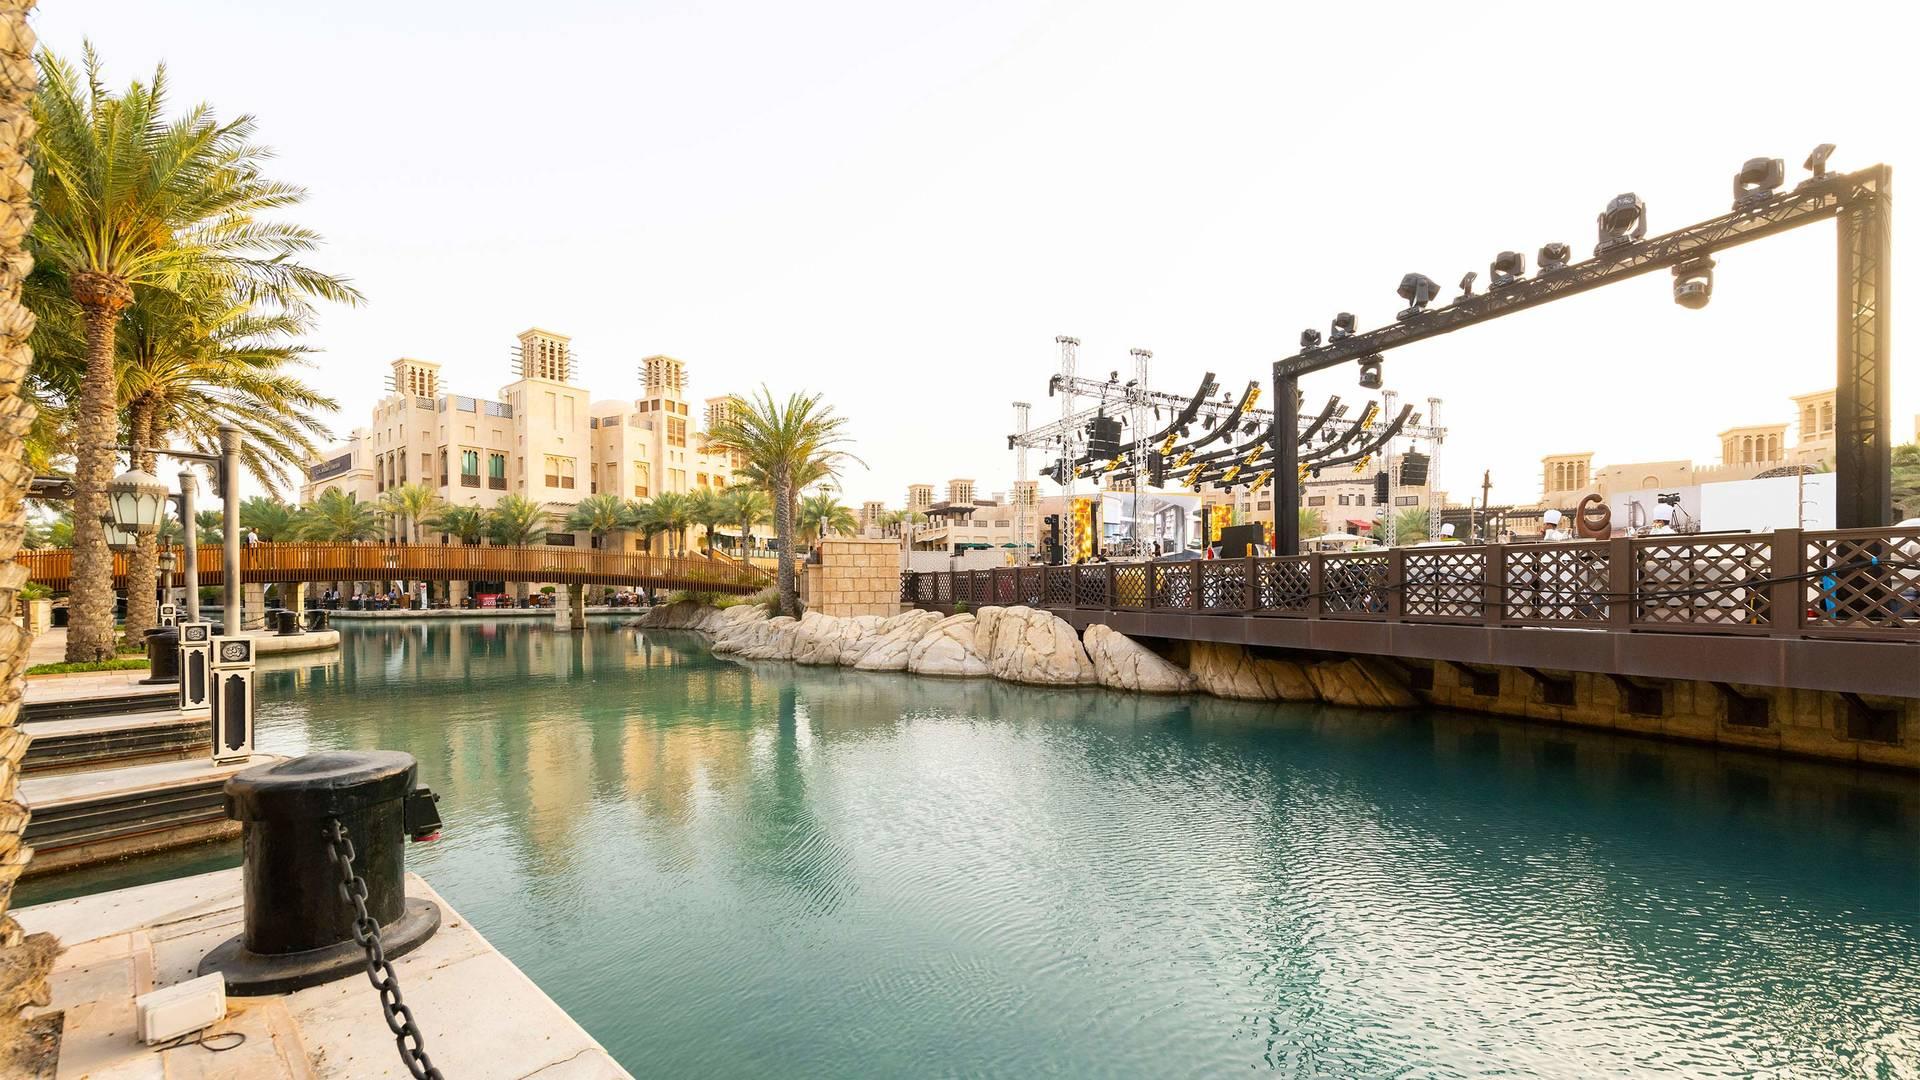 https://cdn.jumeirah.com/-/mediadh/DH/Hospitality/Jumeirah/Occasion/Dubai/Fort-Island-Madinat-Jumeirah-Event-4_16-9.jpg?h=1080&w=1920&hash=9953A305E70EC7B8180BC7D4AA4C1C02